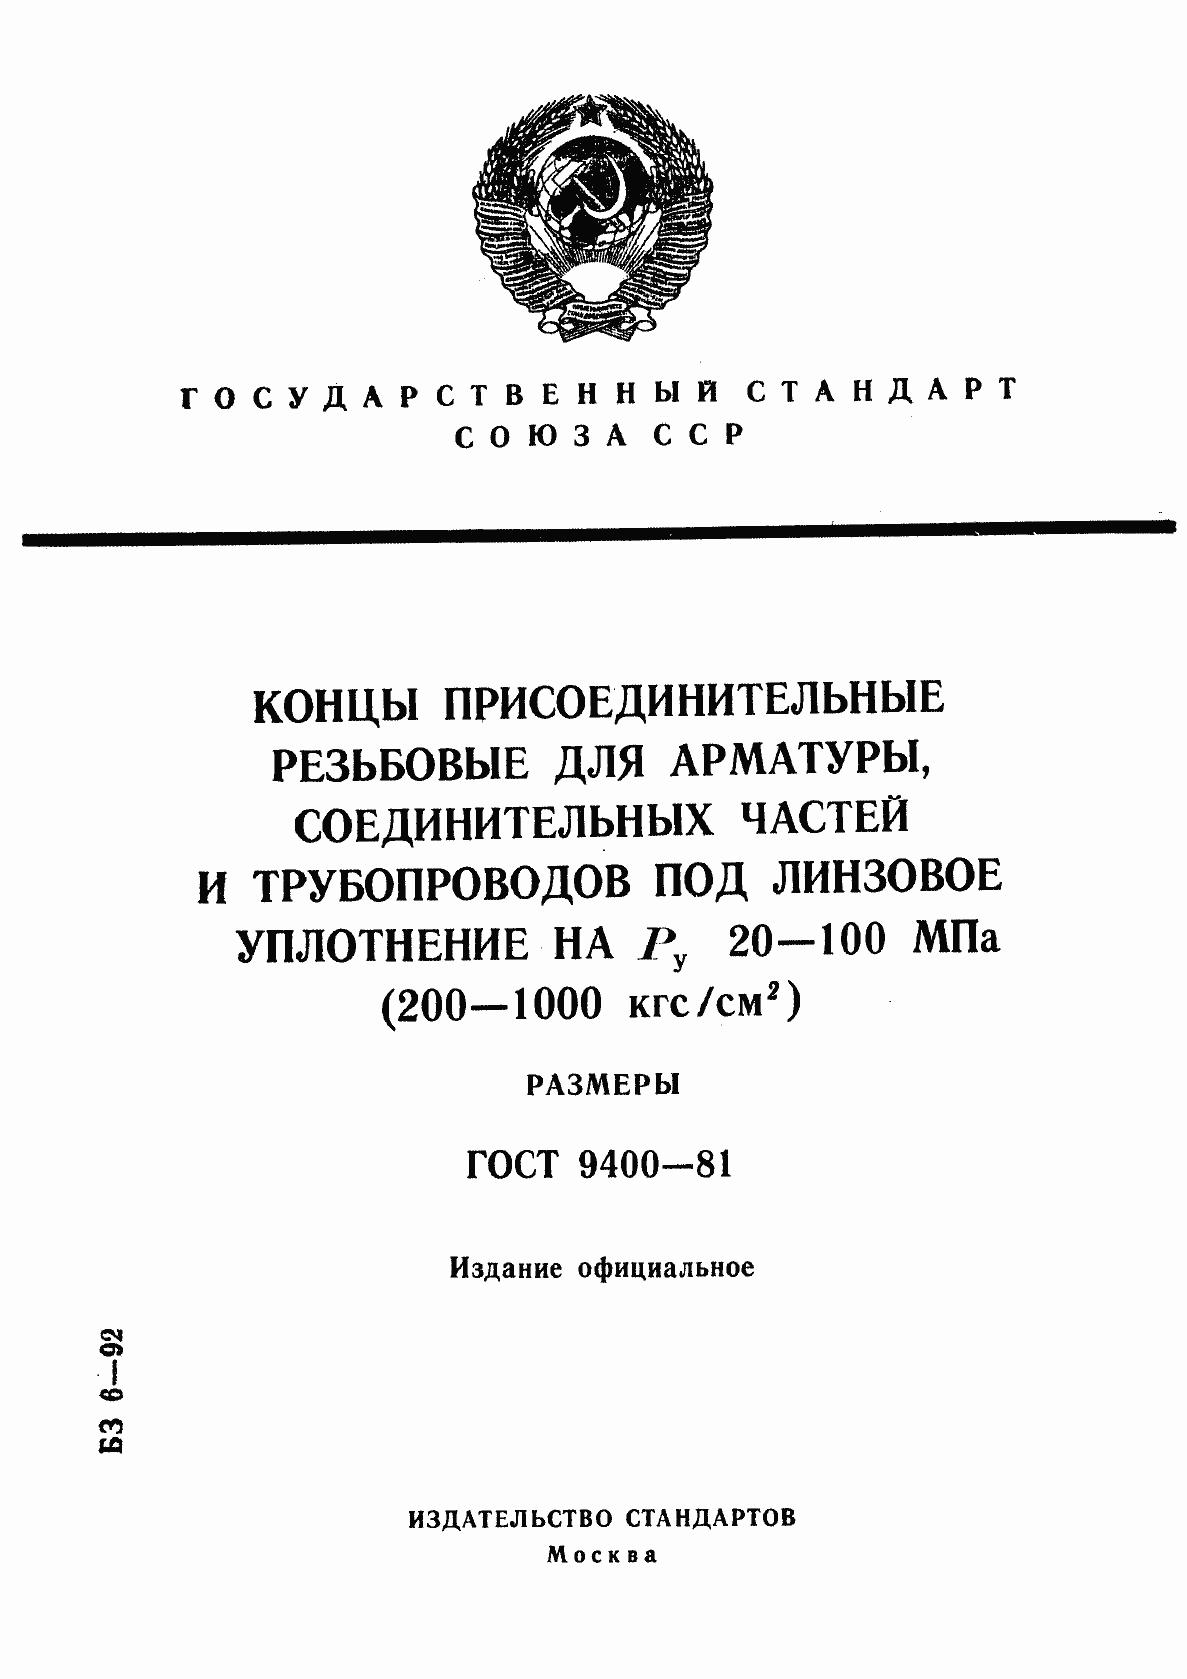 Гост 9400-81